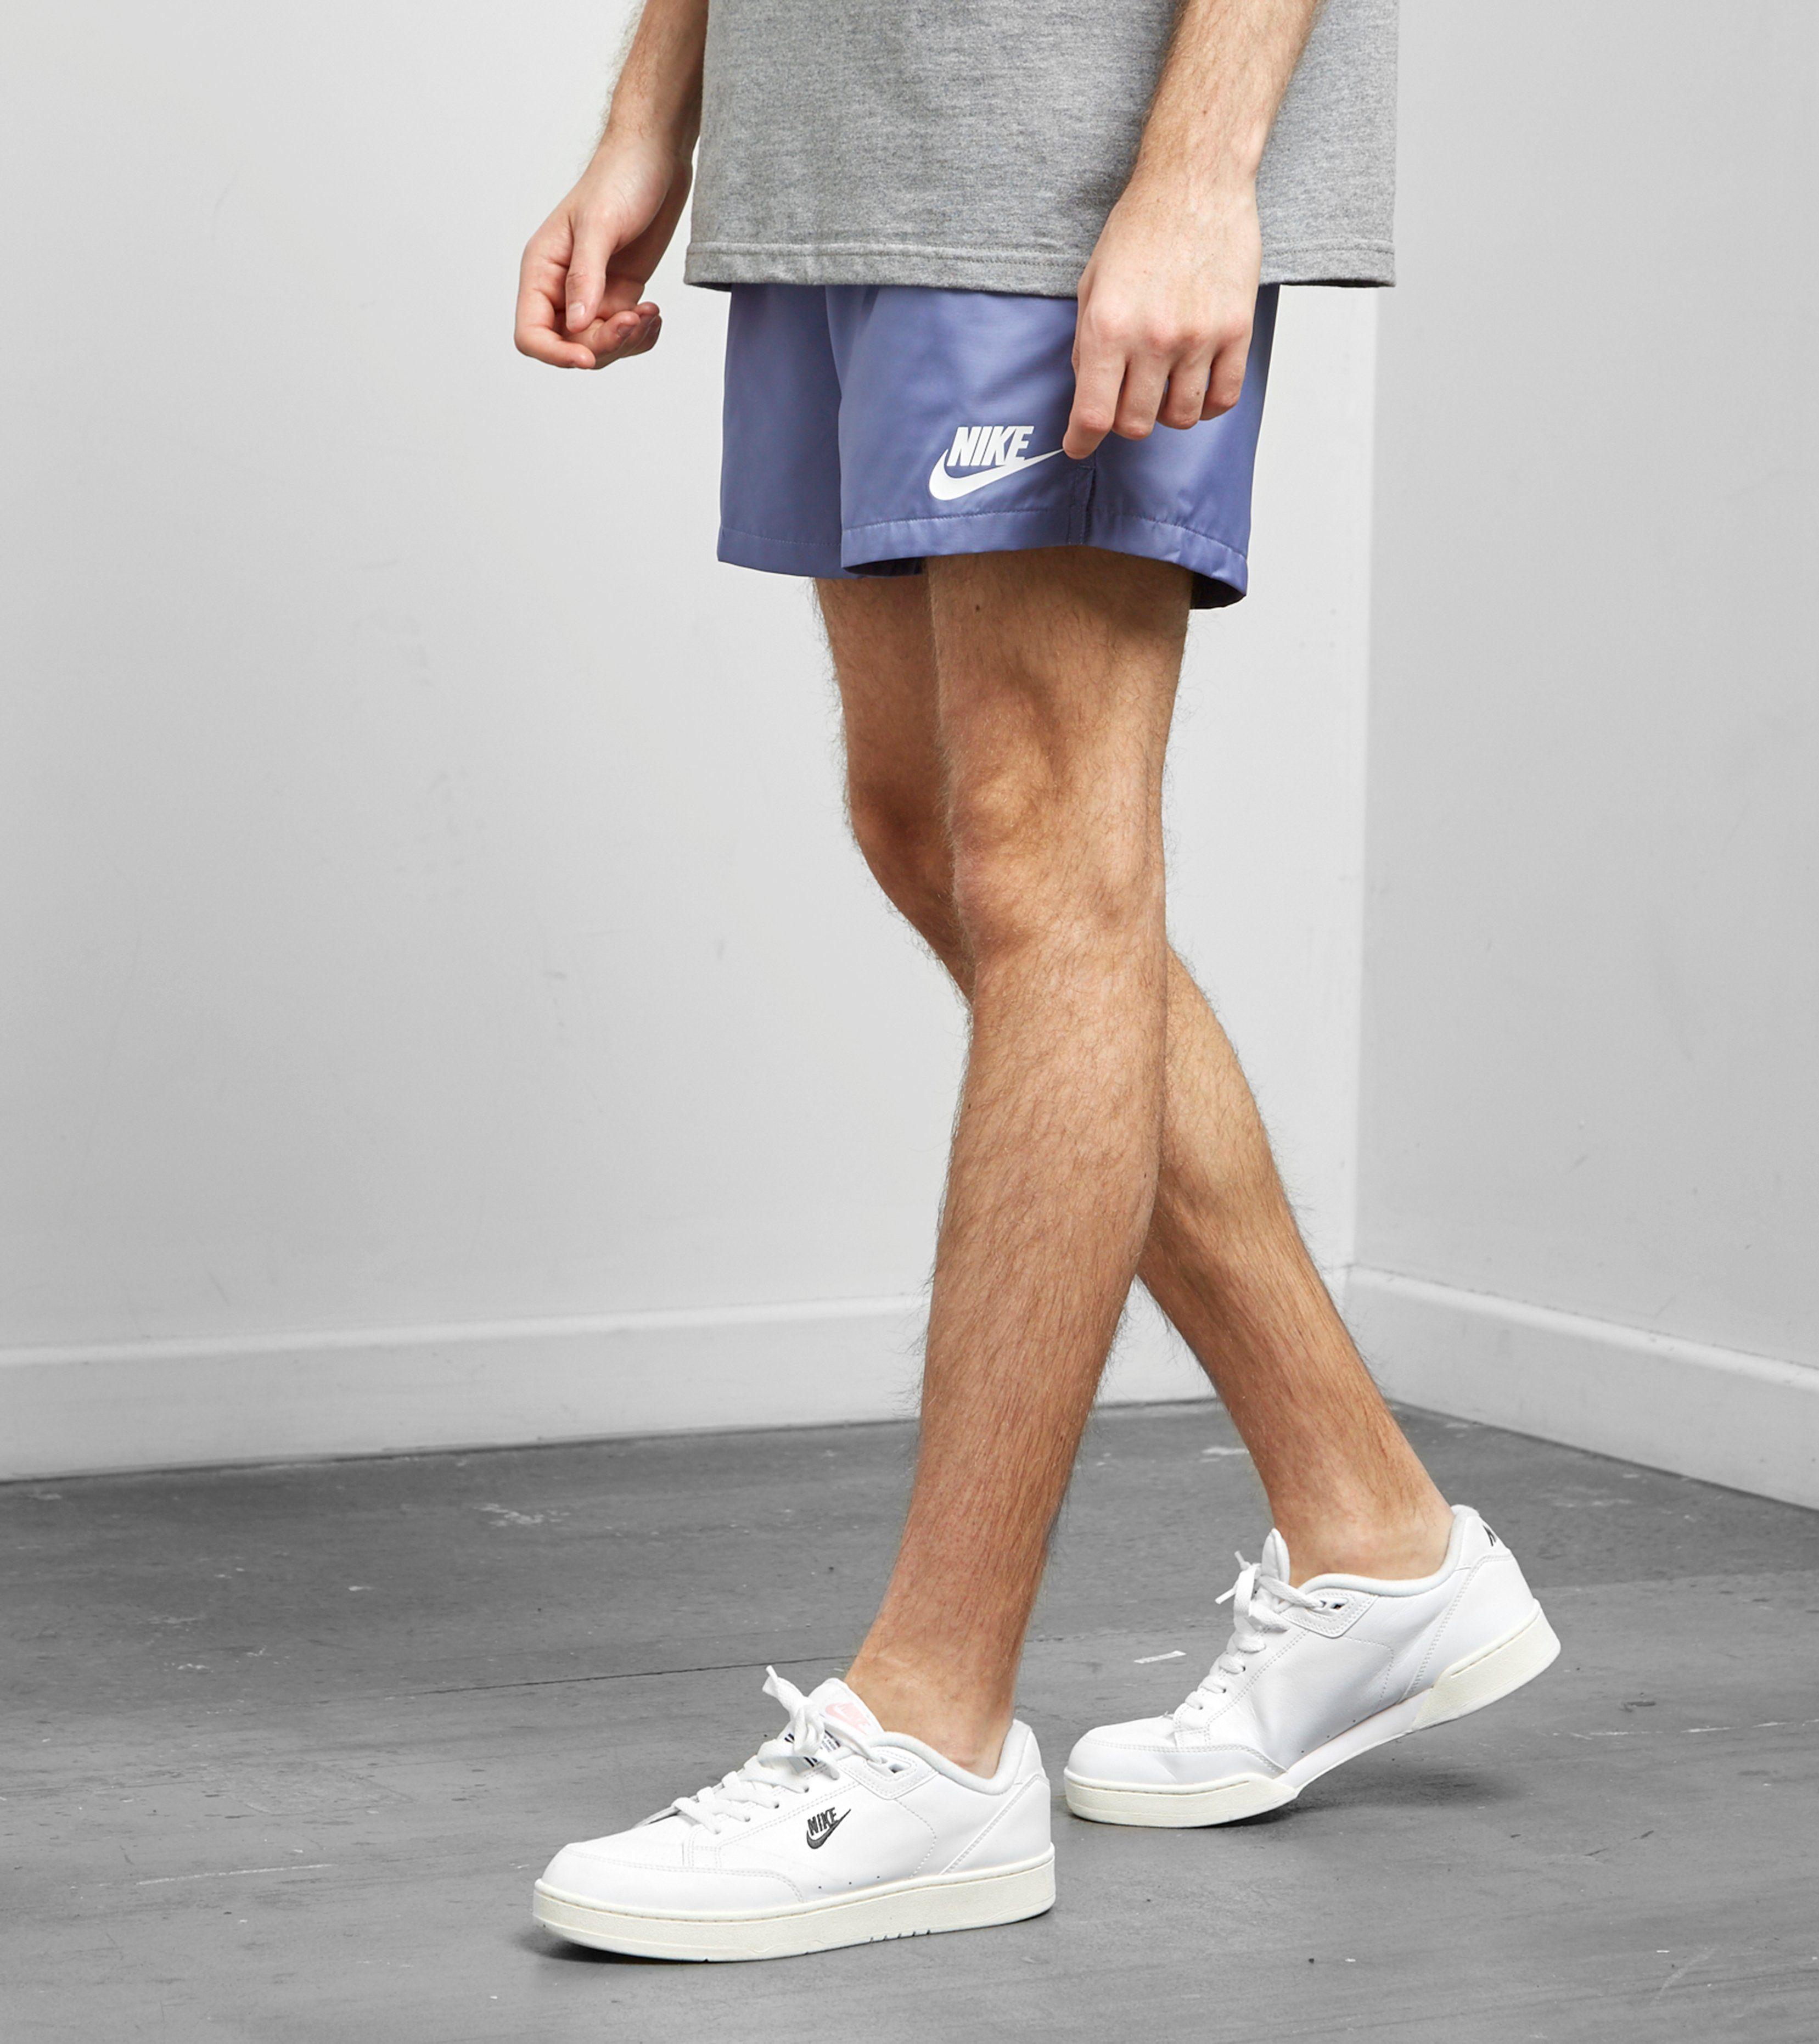 Nike Flow Swim Shorts